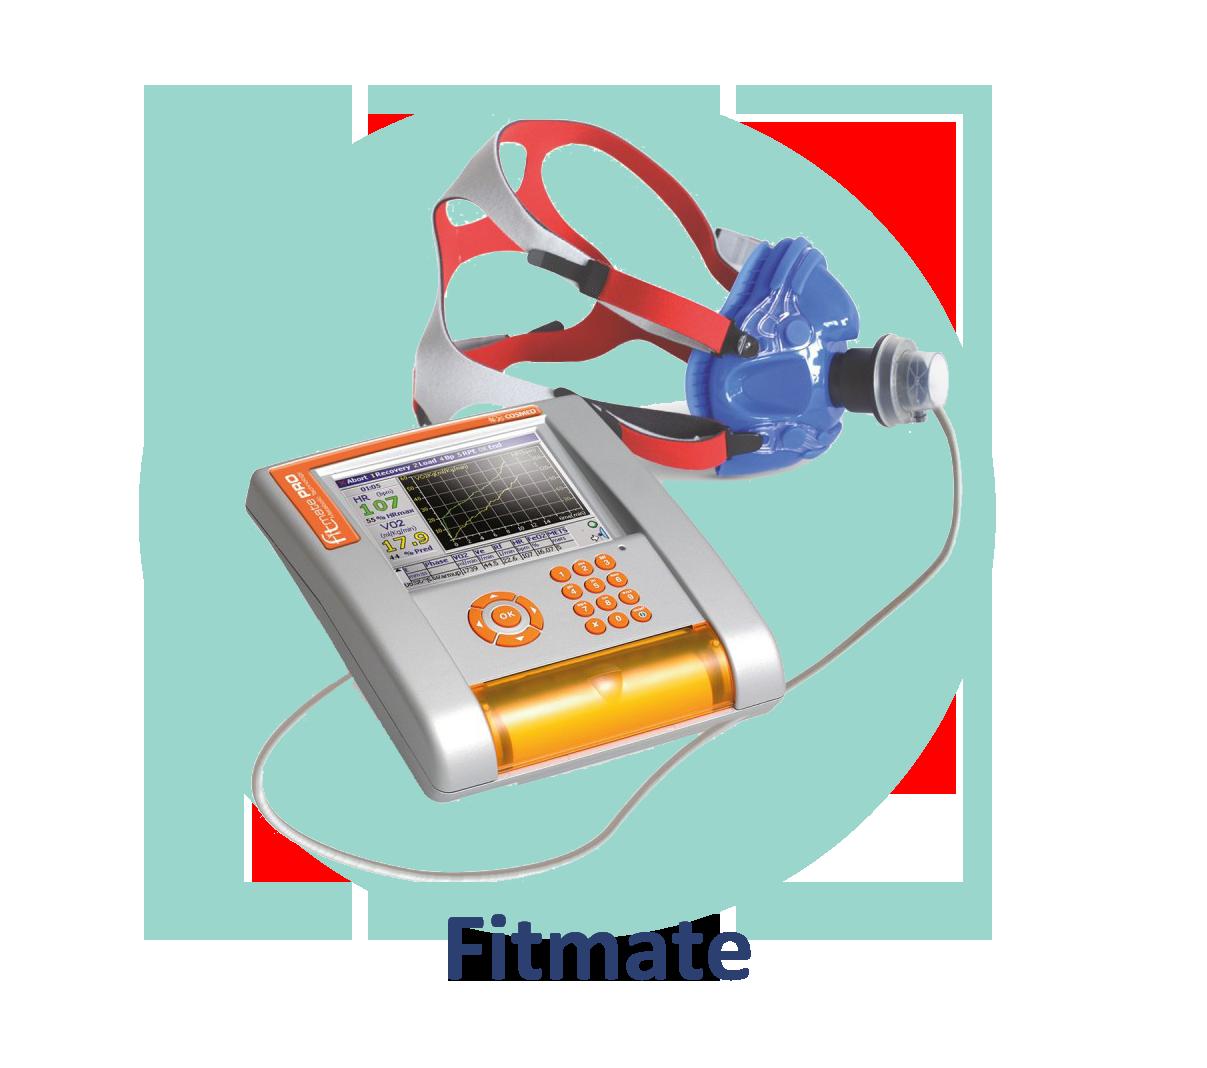 setare-taban-گروه-ستاره-بادی-باکس-Body-box-اسپیرومتری-PFT-IOS-تست-ریه-عملکرد-ریوی-Chest-Cosmed-vitalograph-aim-PEF-FVC-calorimeter-کالری-متر-indirect-fat-تغذیه-Pletysmography- fitmate-nutrition